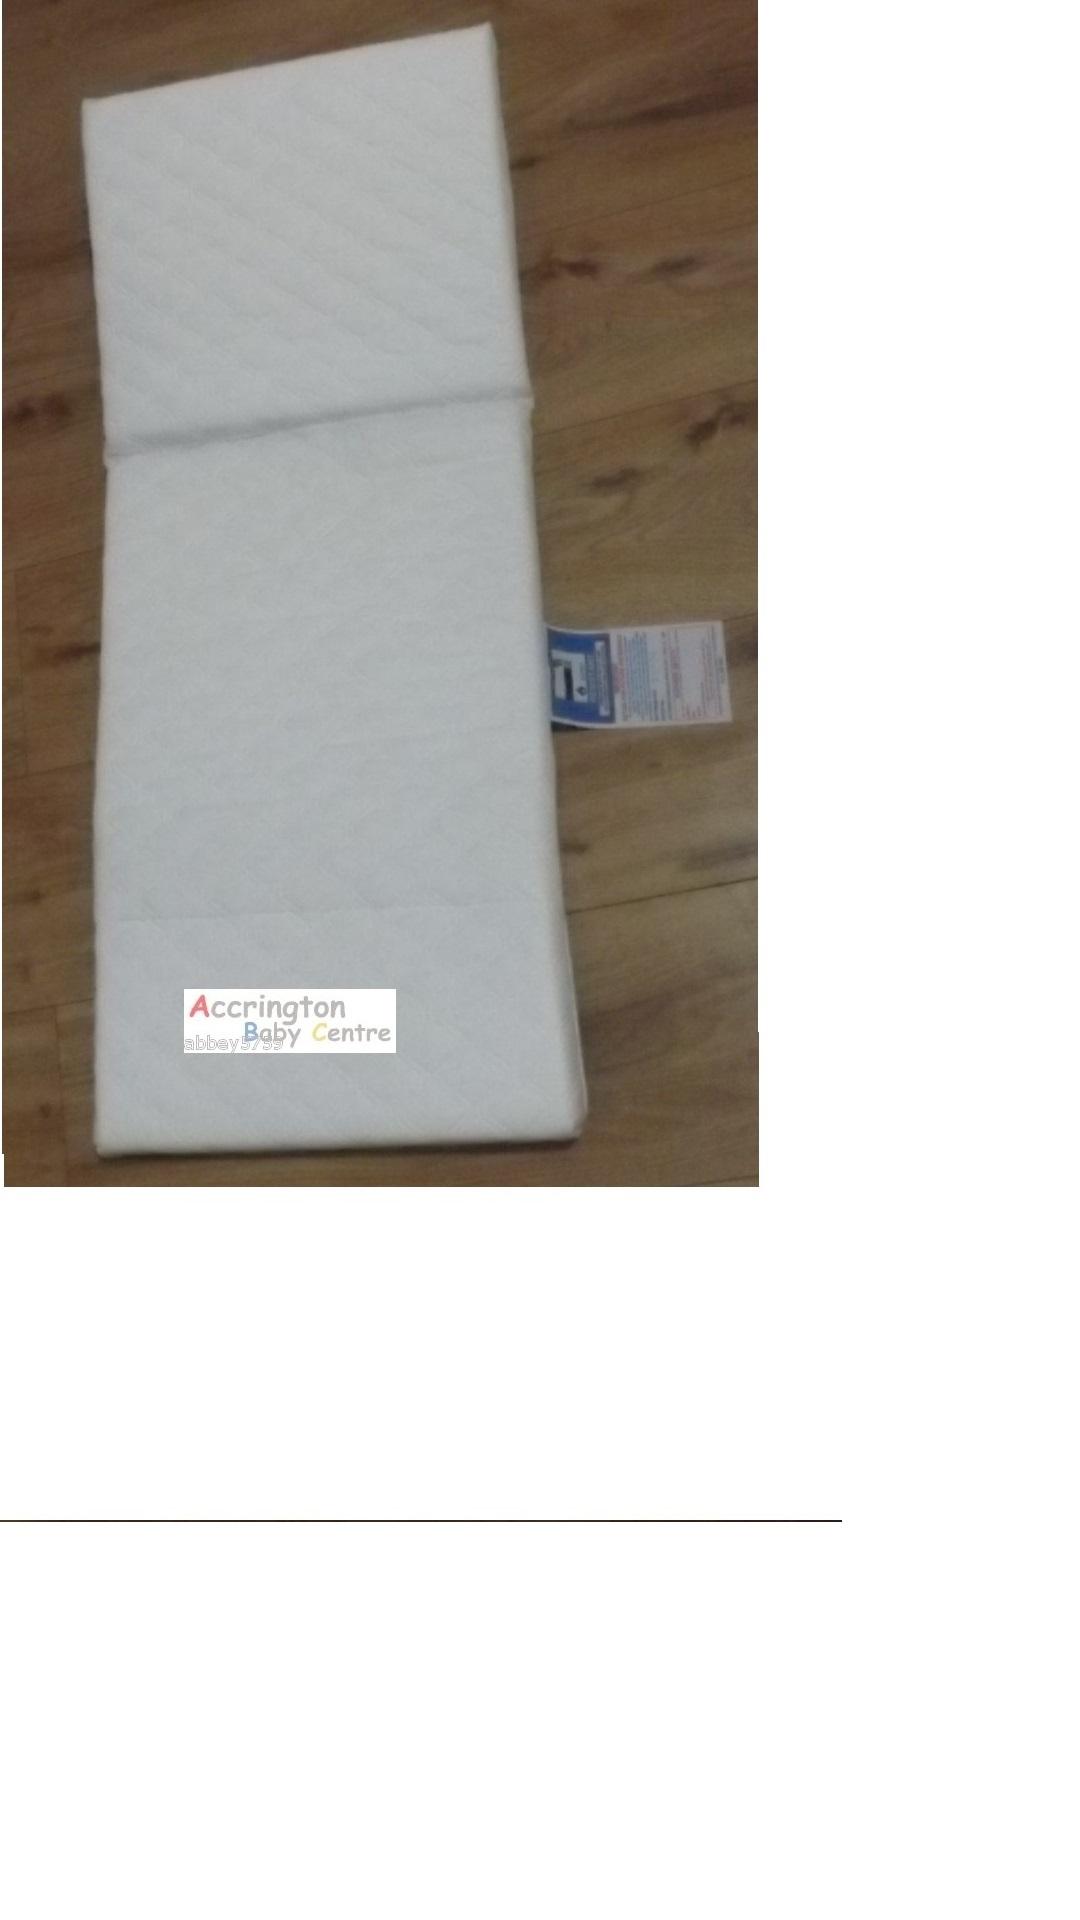 NEW SAFETY MATTRESS 85 x 36 cm 4 Balmoral Silver Cross